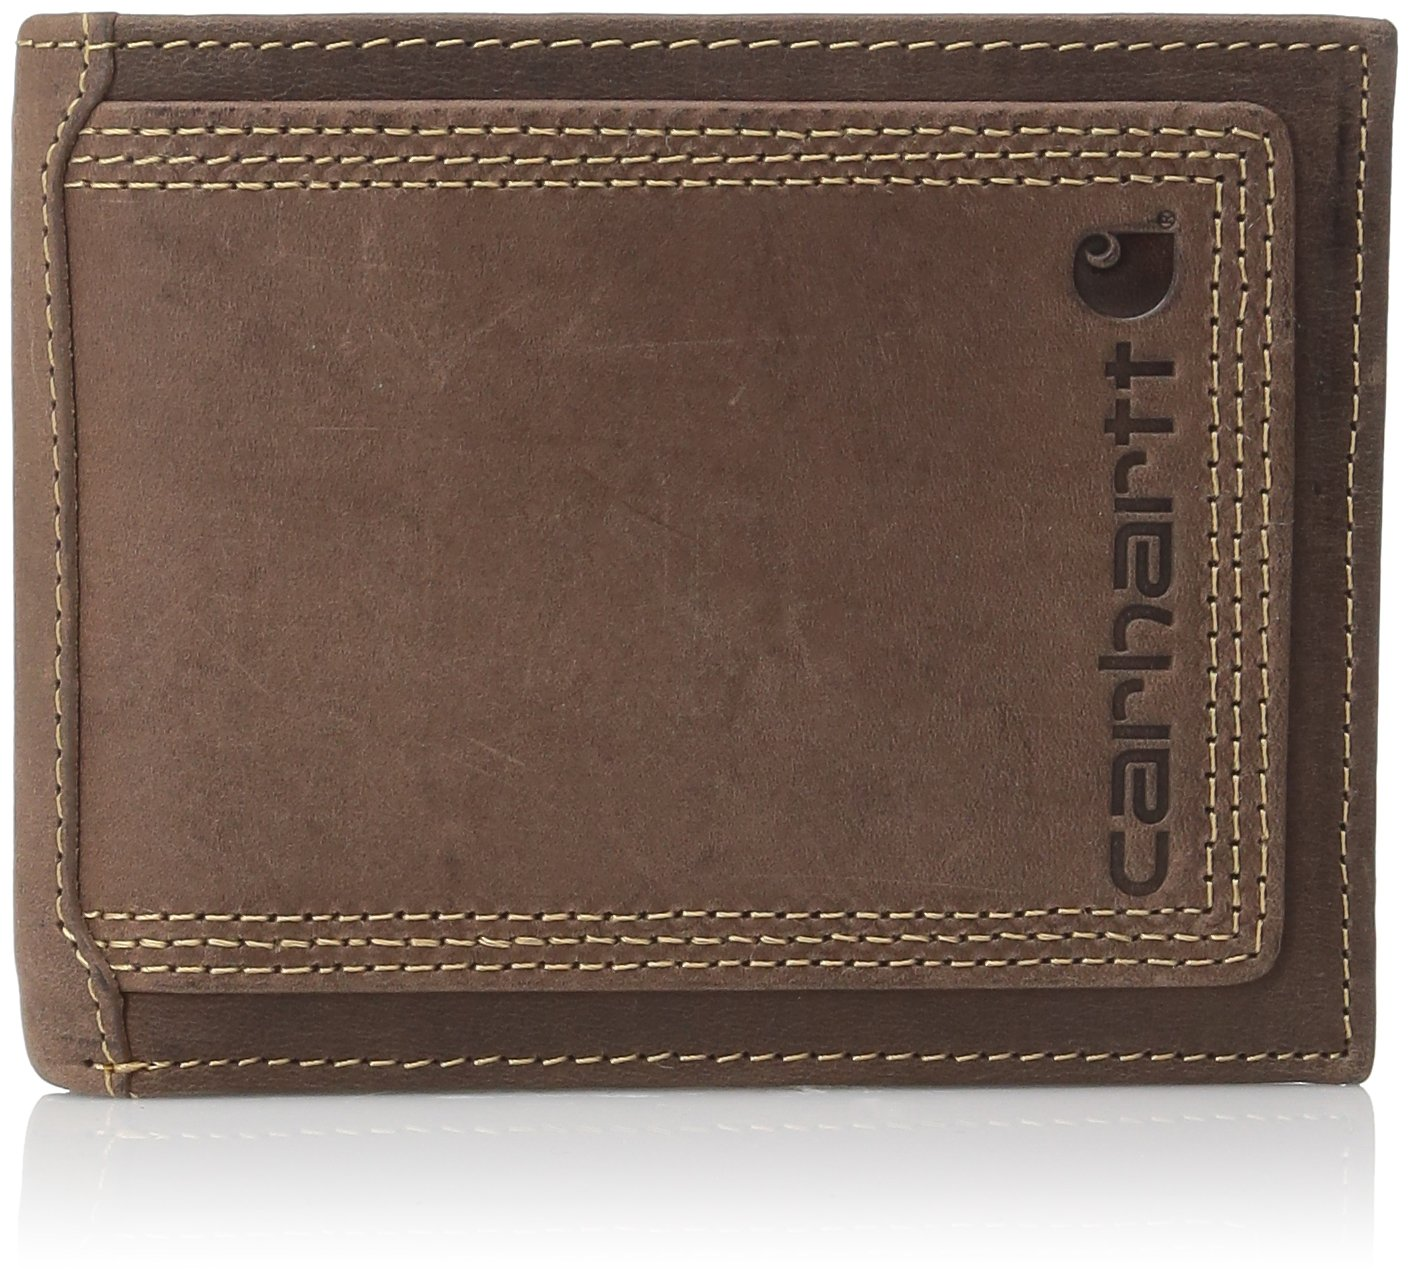 Carhartt Billfold Wallet Brown Contrast